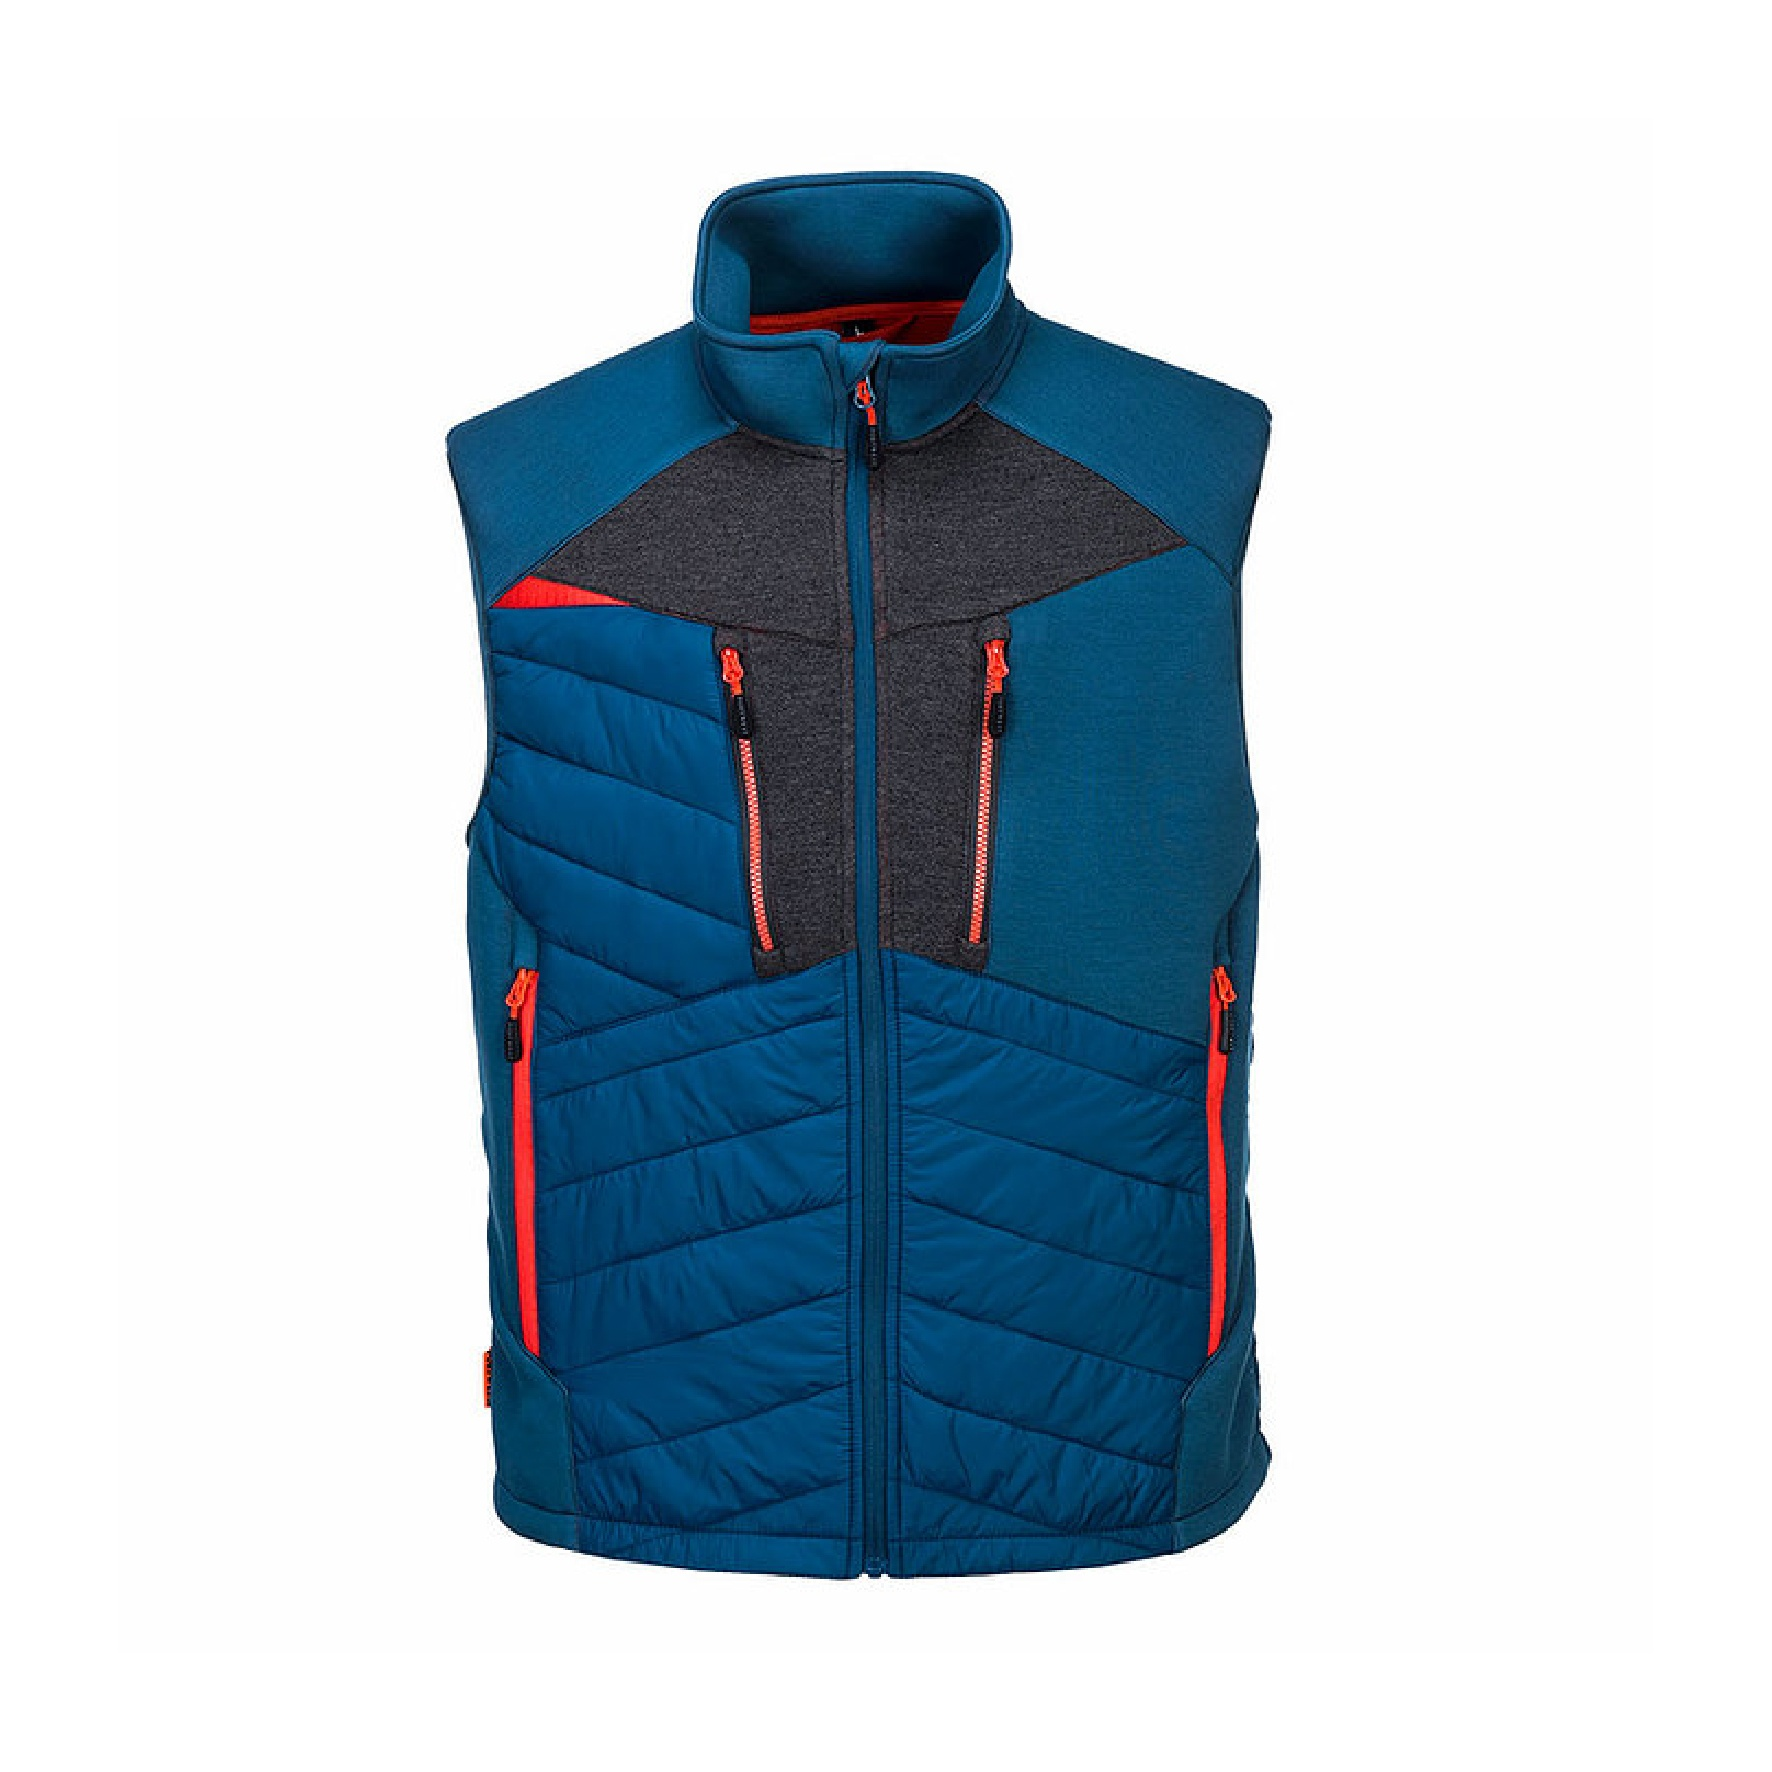 Redrok Workwear Centre Plymouth - Portwest - DX4 Baffle Gilet Metro Blue